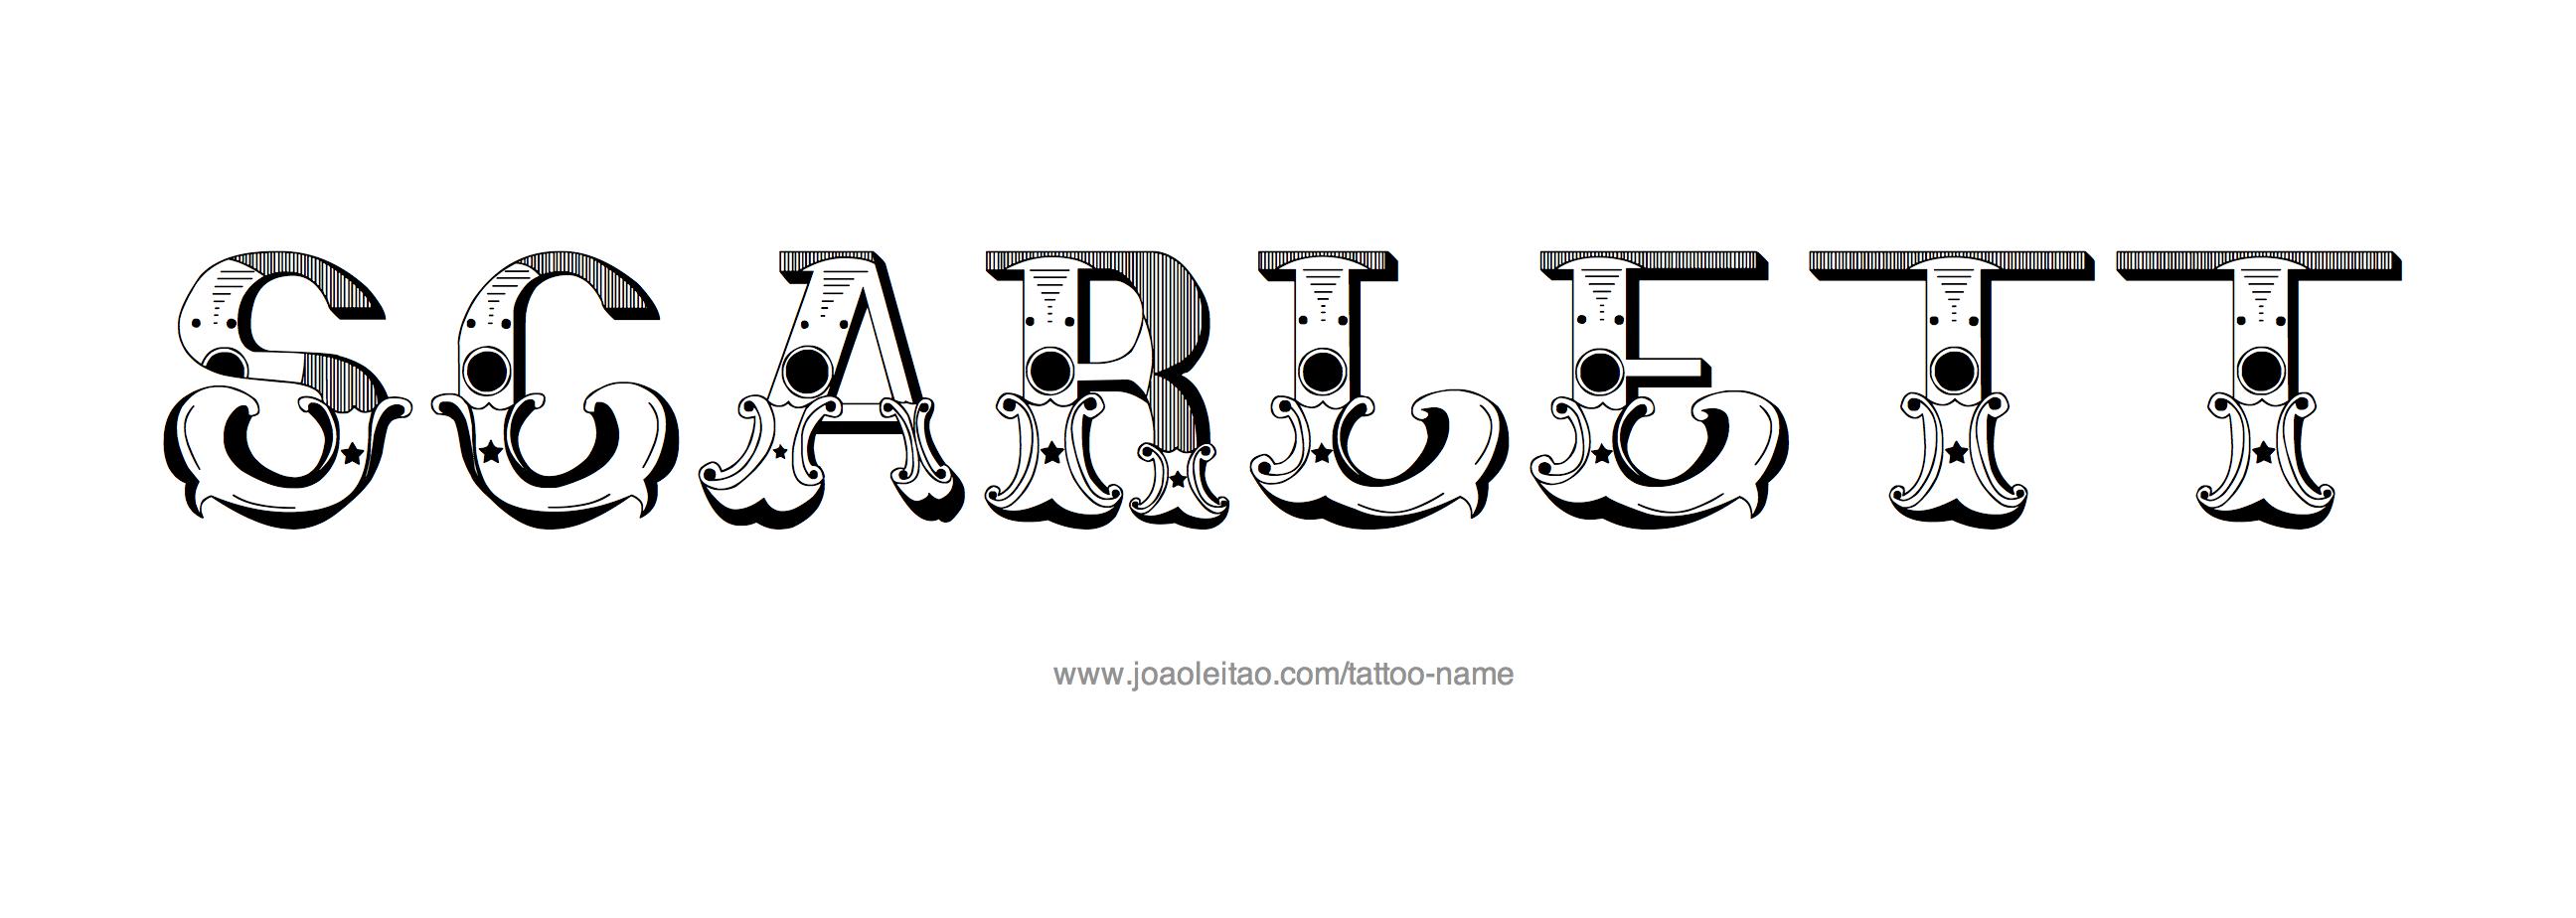 scarlett name tattoo designs. Black Bedroom Furniture Sets. Home Design Ideas